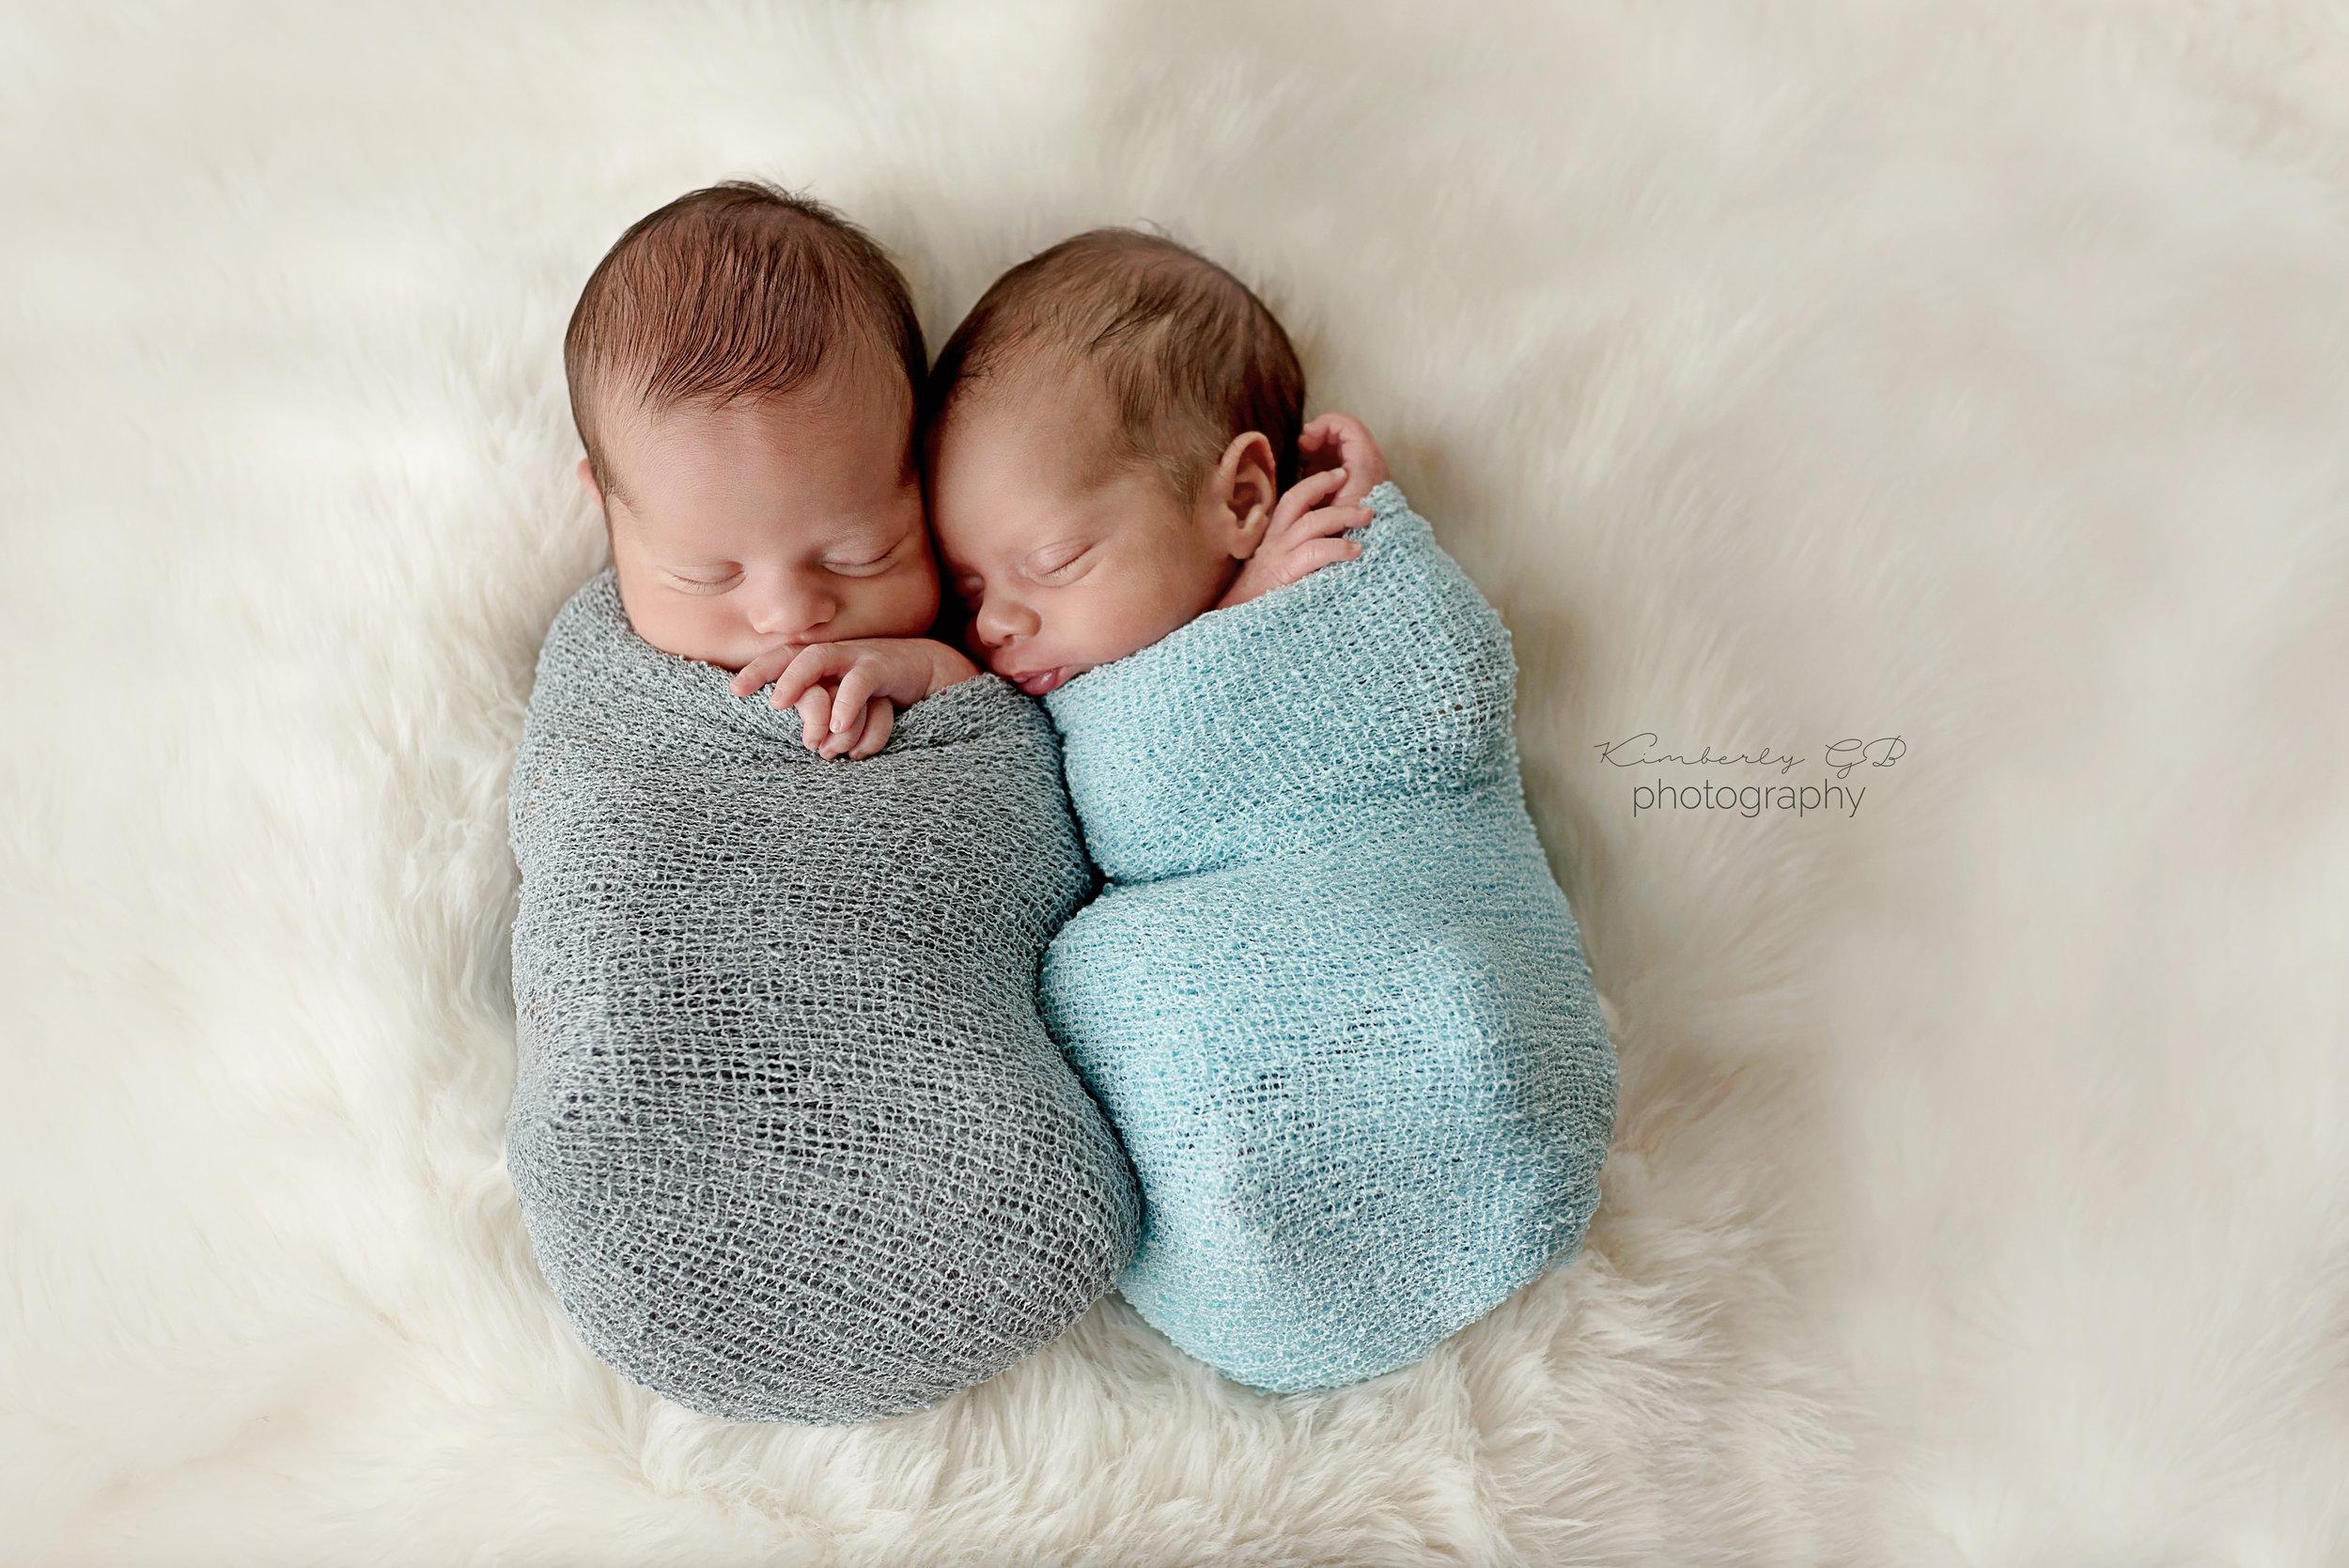 fotografia-de-recien-nacidos-bebes-newborn-en-puerto-rico-kimberly-gb-photography-fotografa-31.jpg